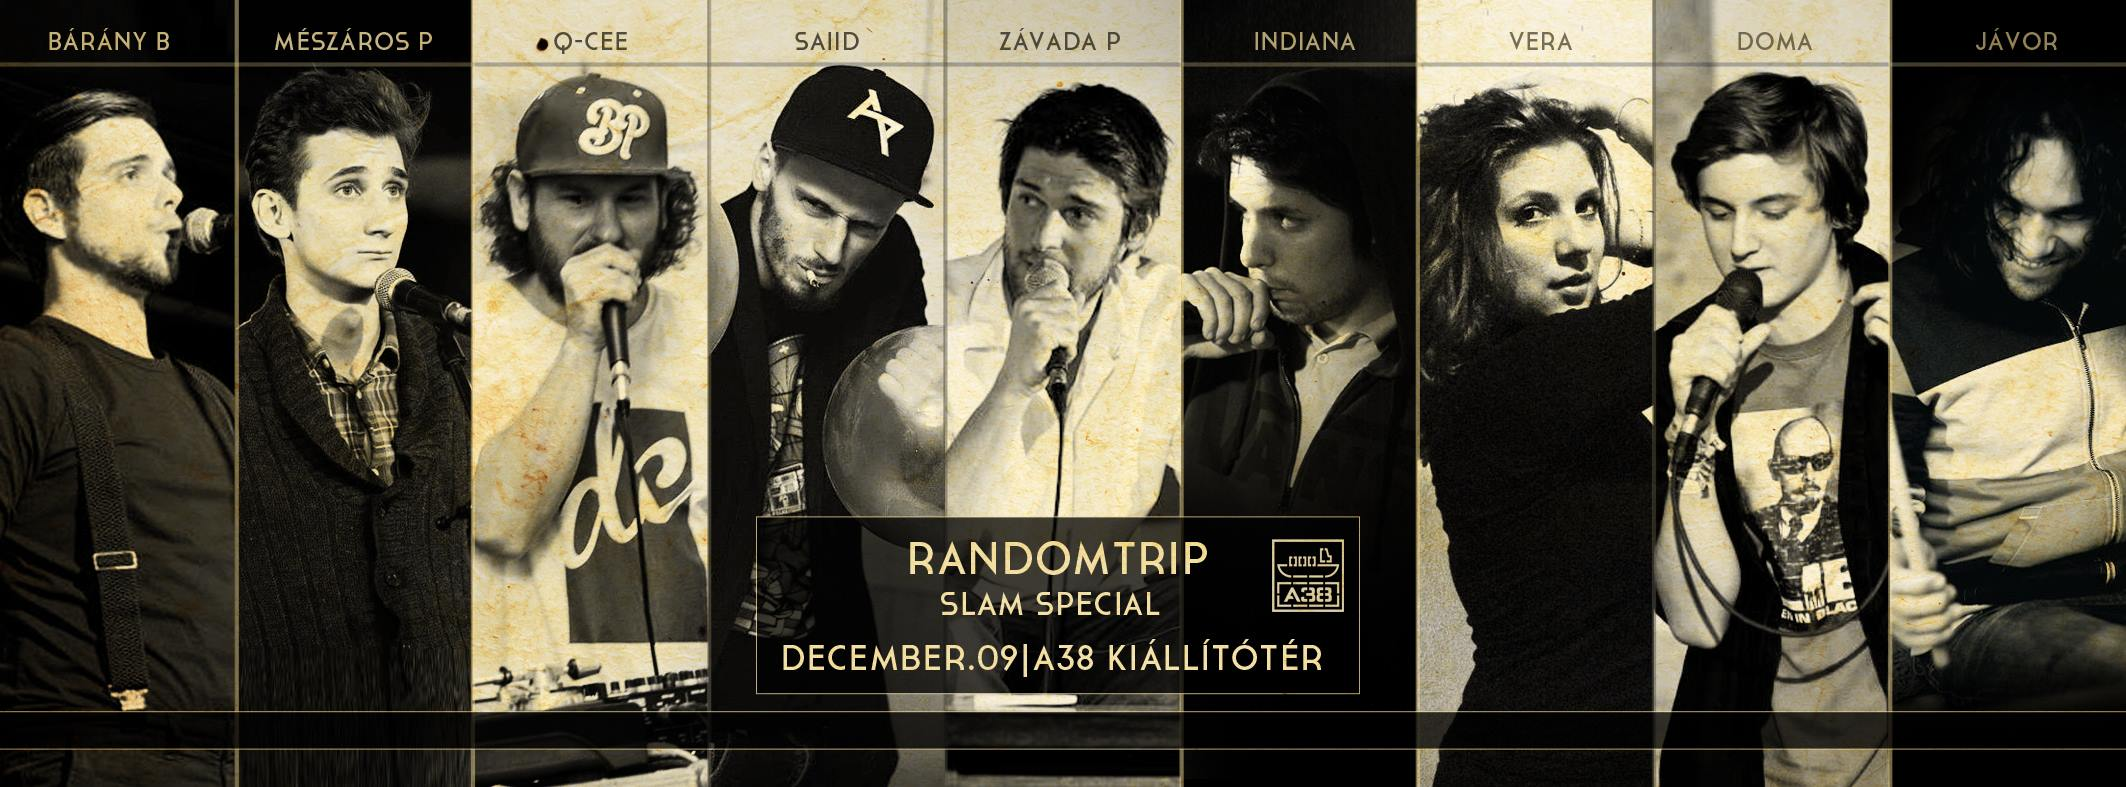 Random Trip Slam Special